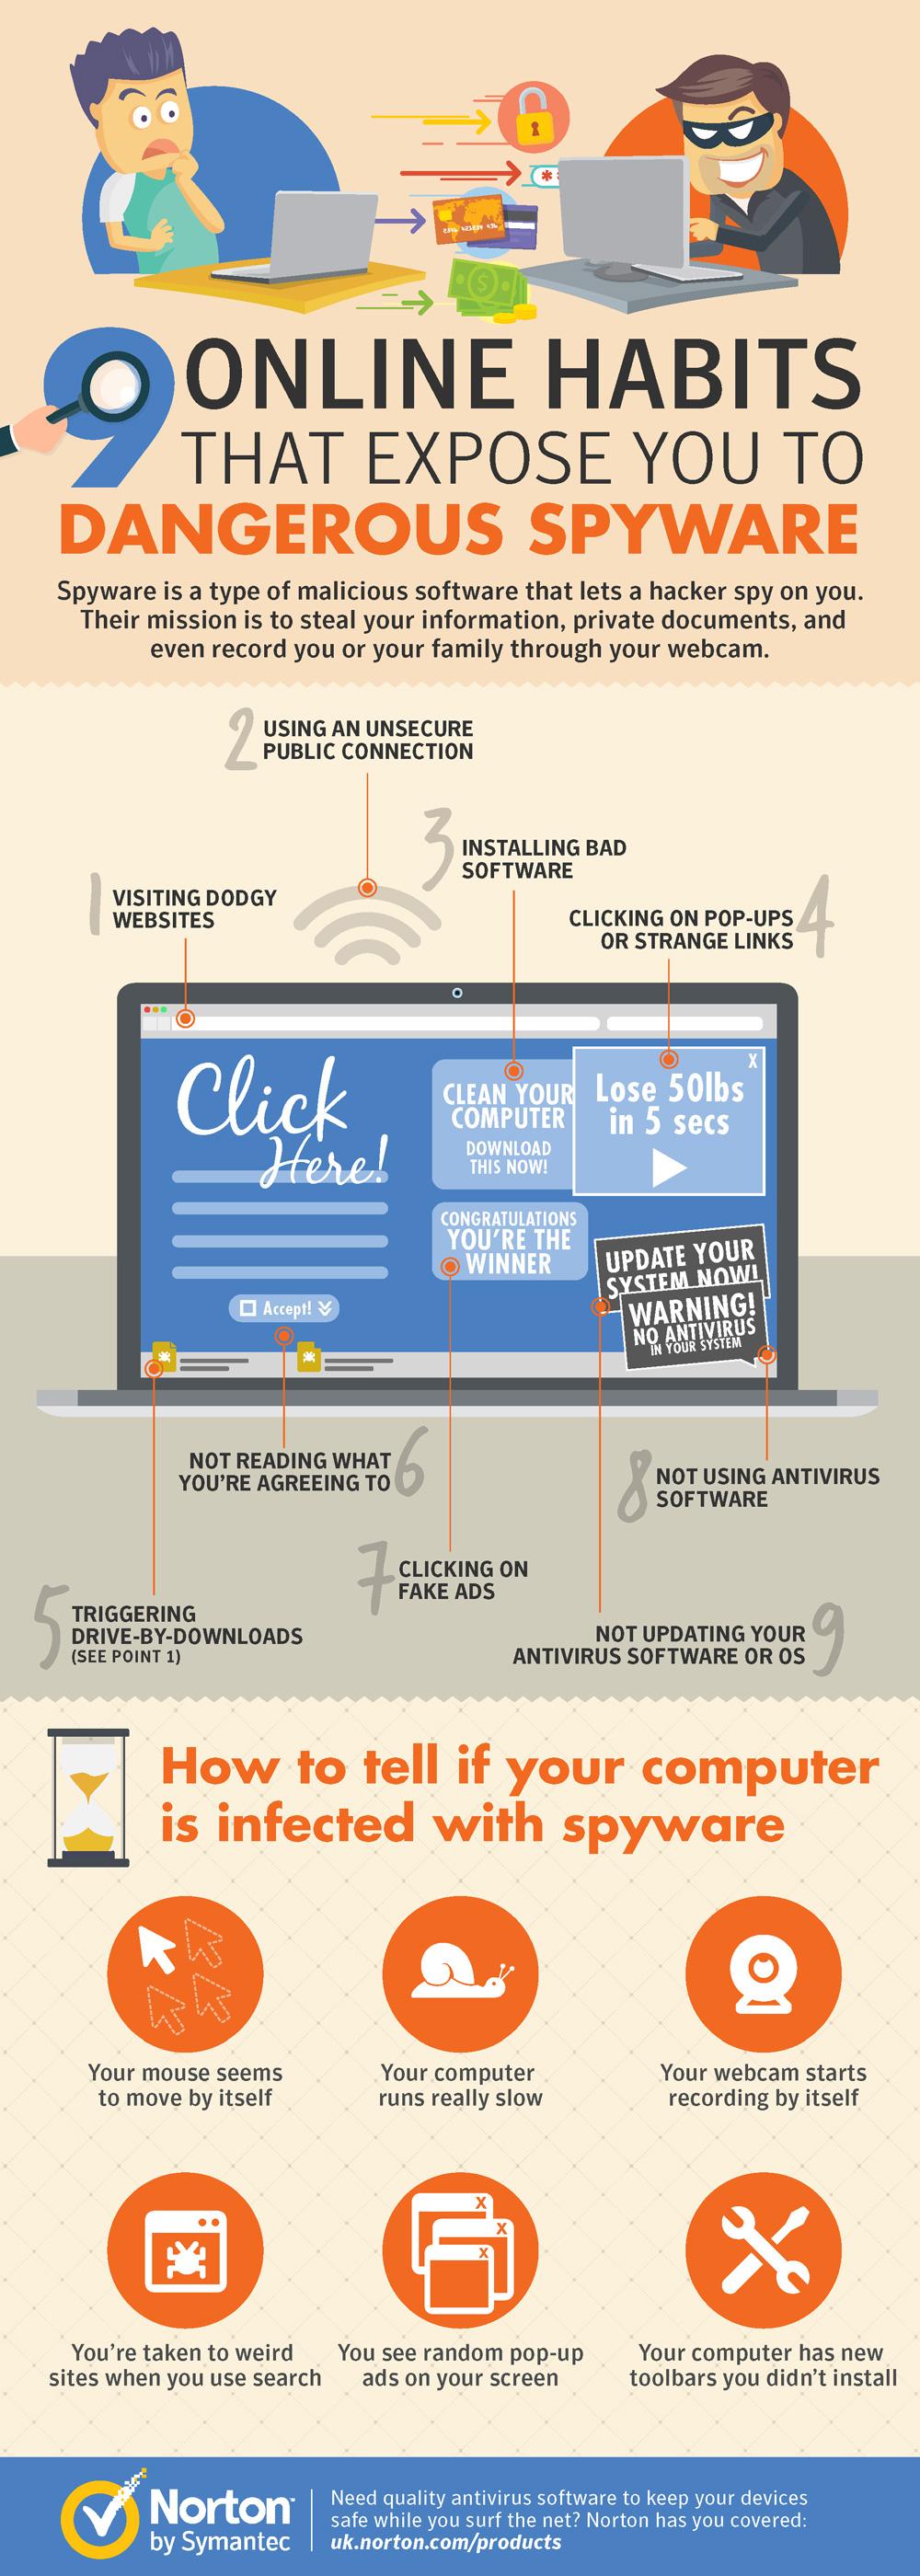 512 9 Online Habits